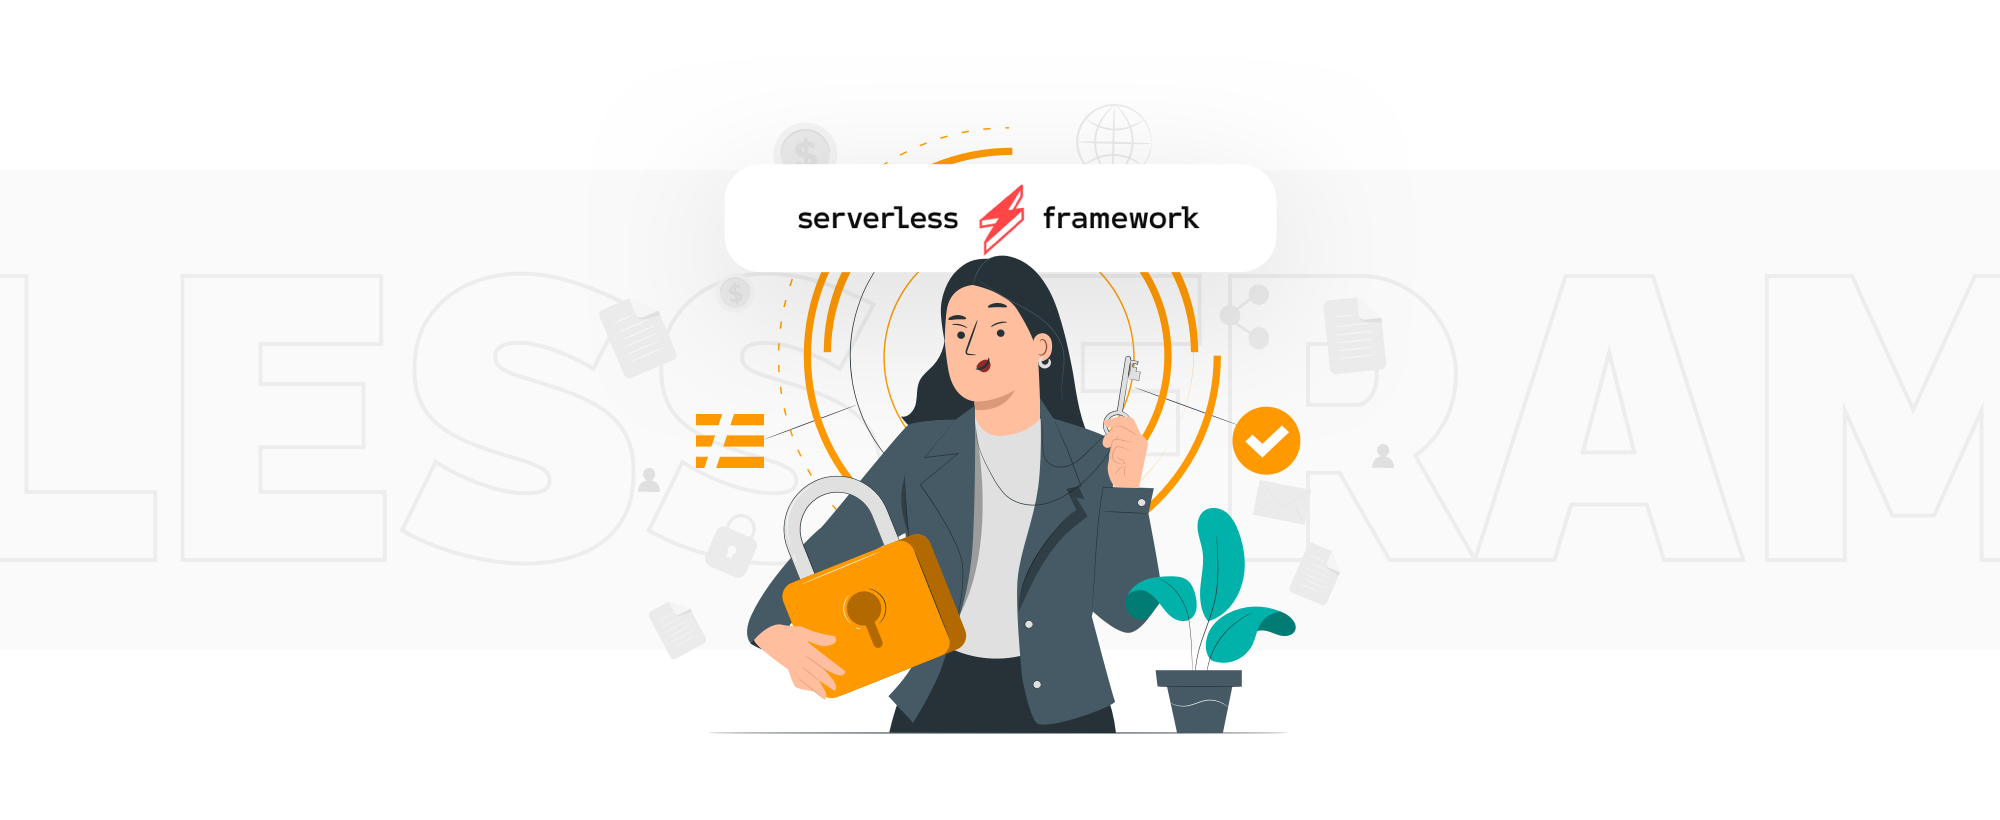 Key Advantages and Disadvantages of Serverless Framework | TechMagic.co